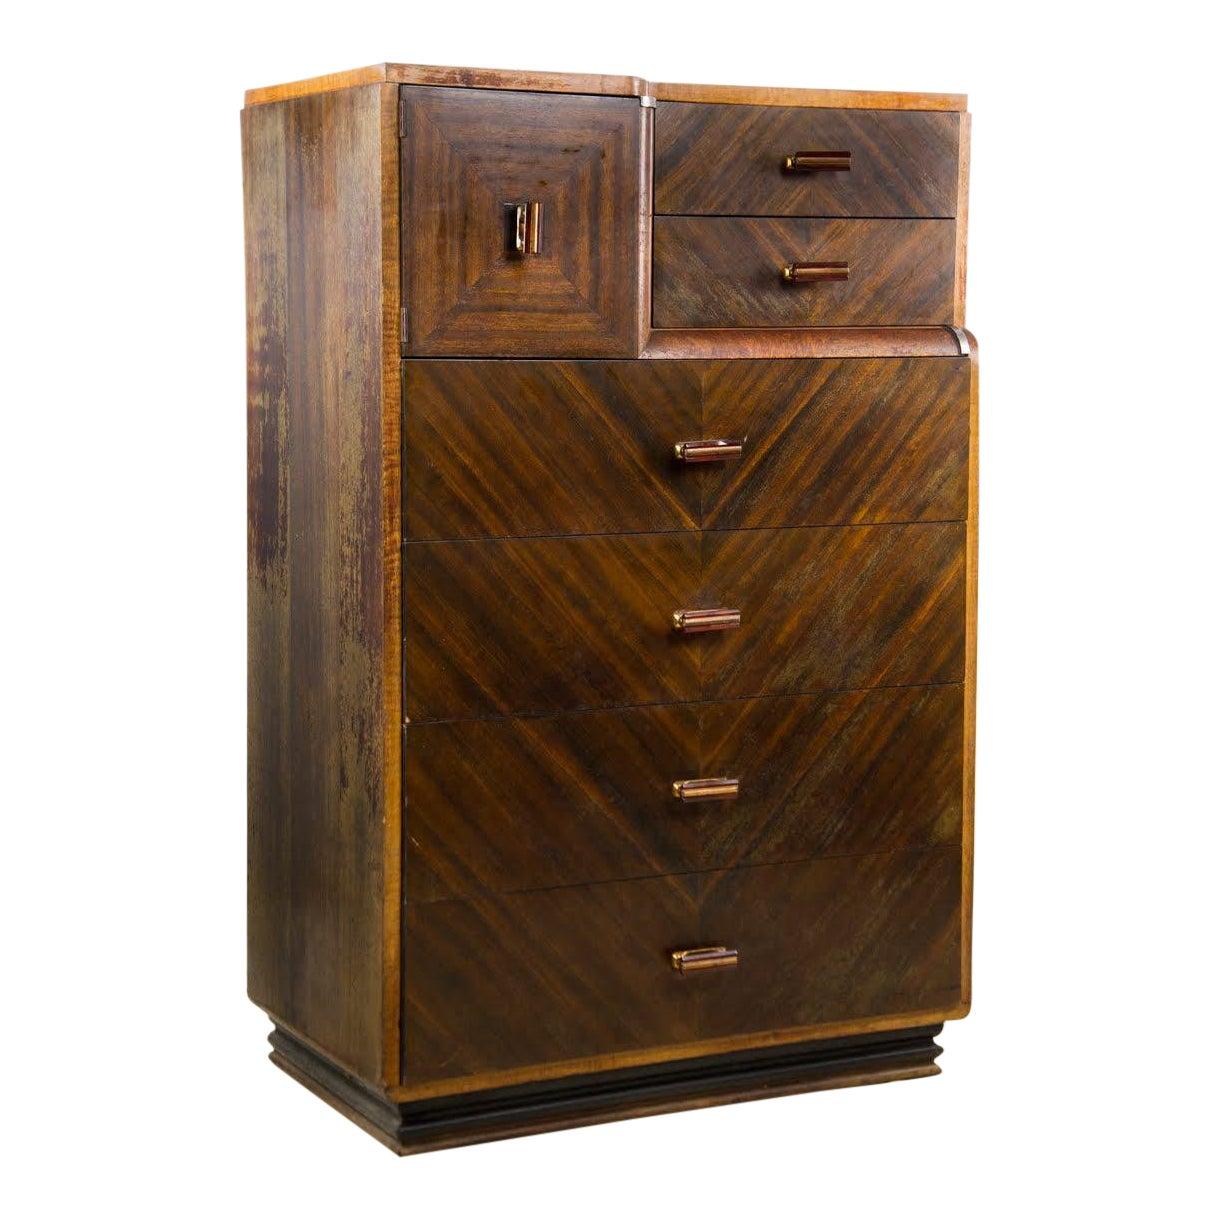 Sekera furniture co mid century modern 7 drawer dresser chairish